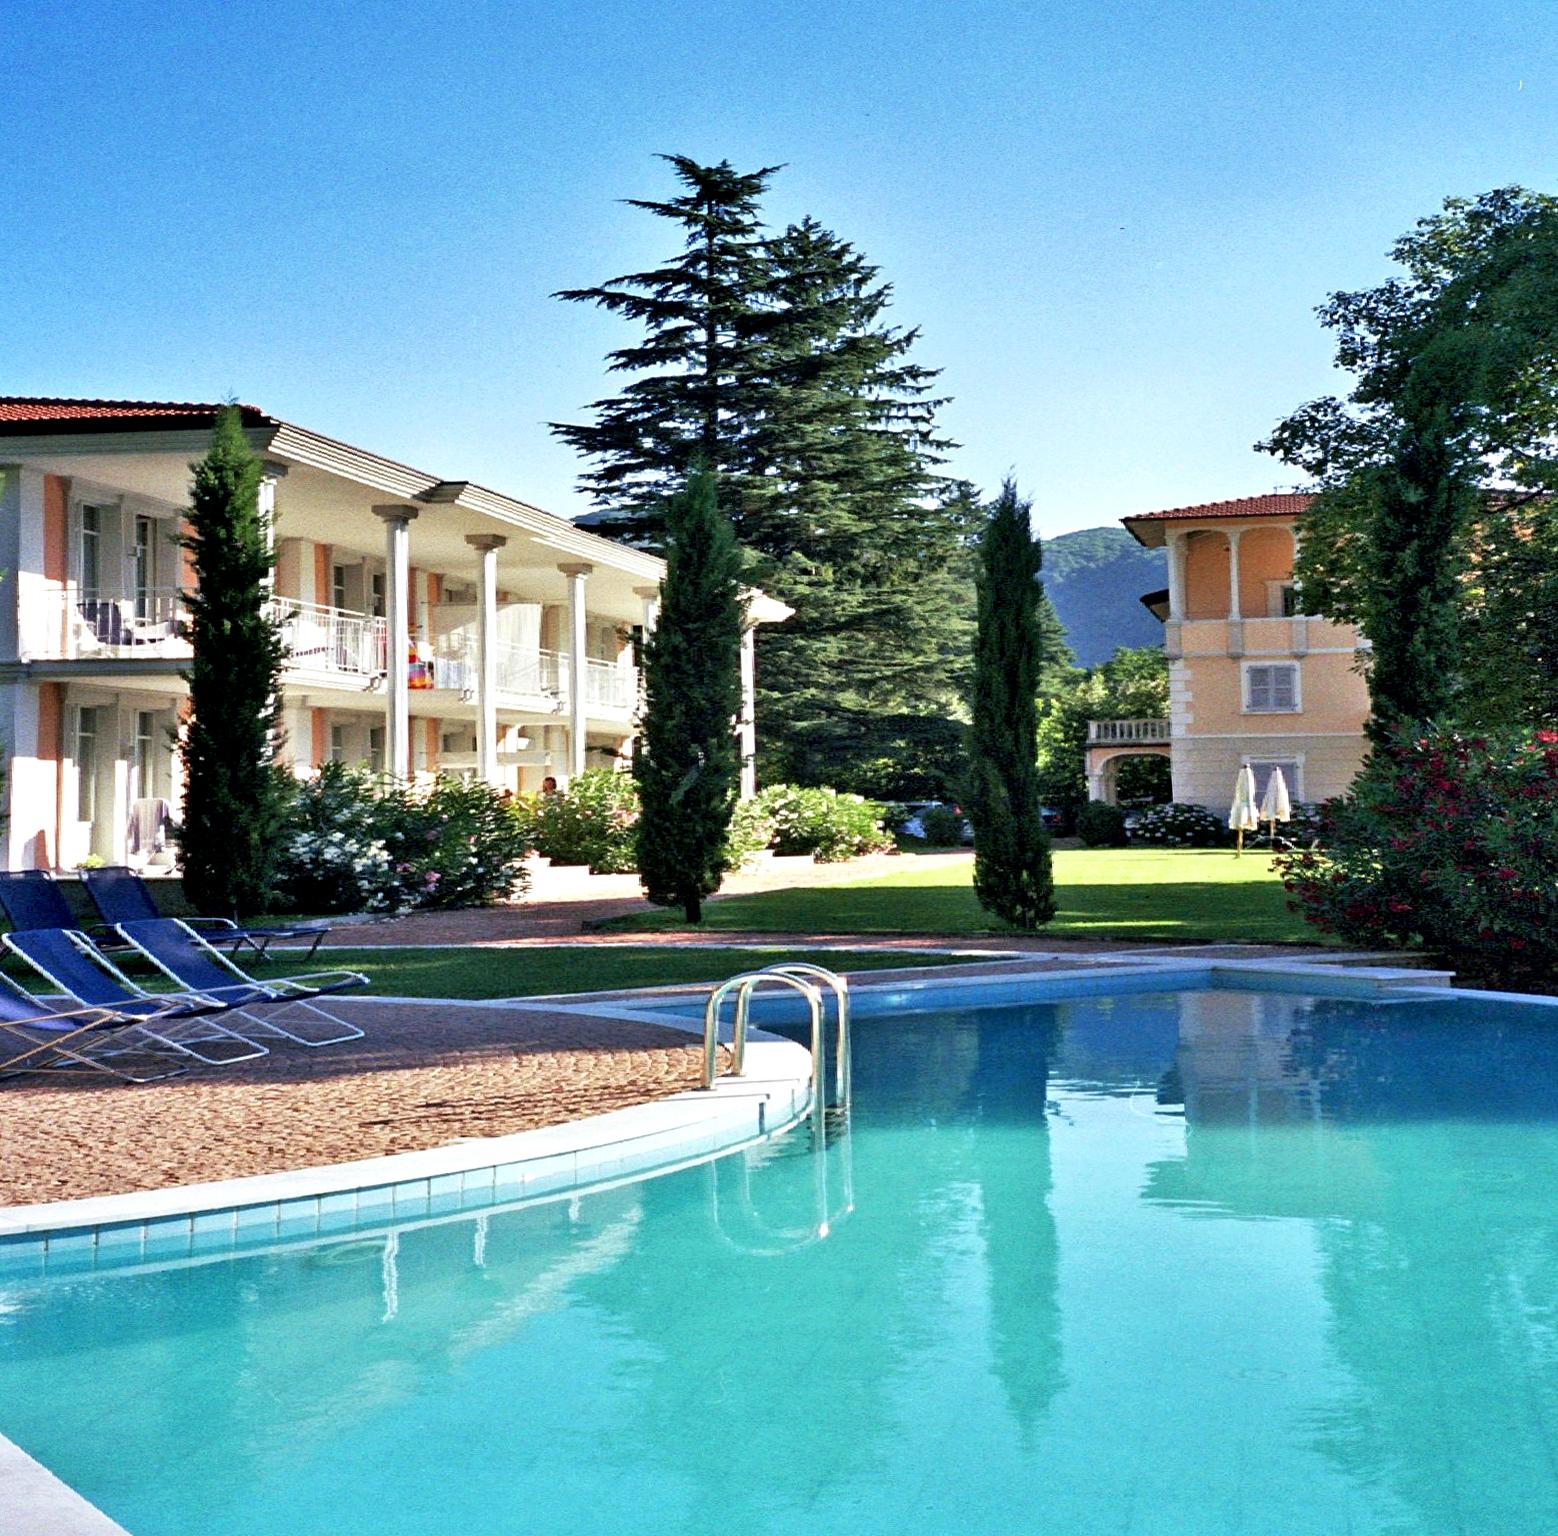 Location Villa Piscine Lugano Italie